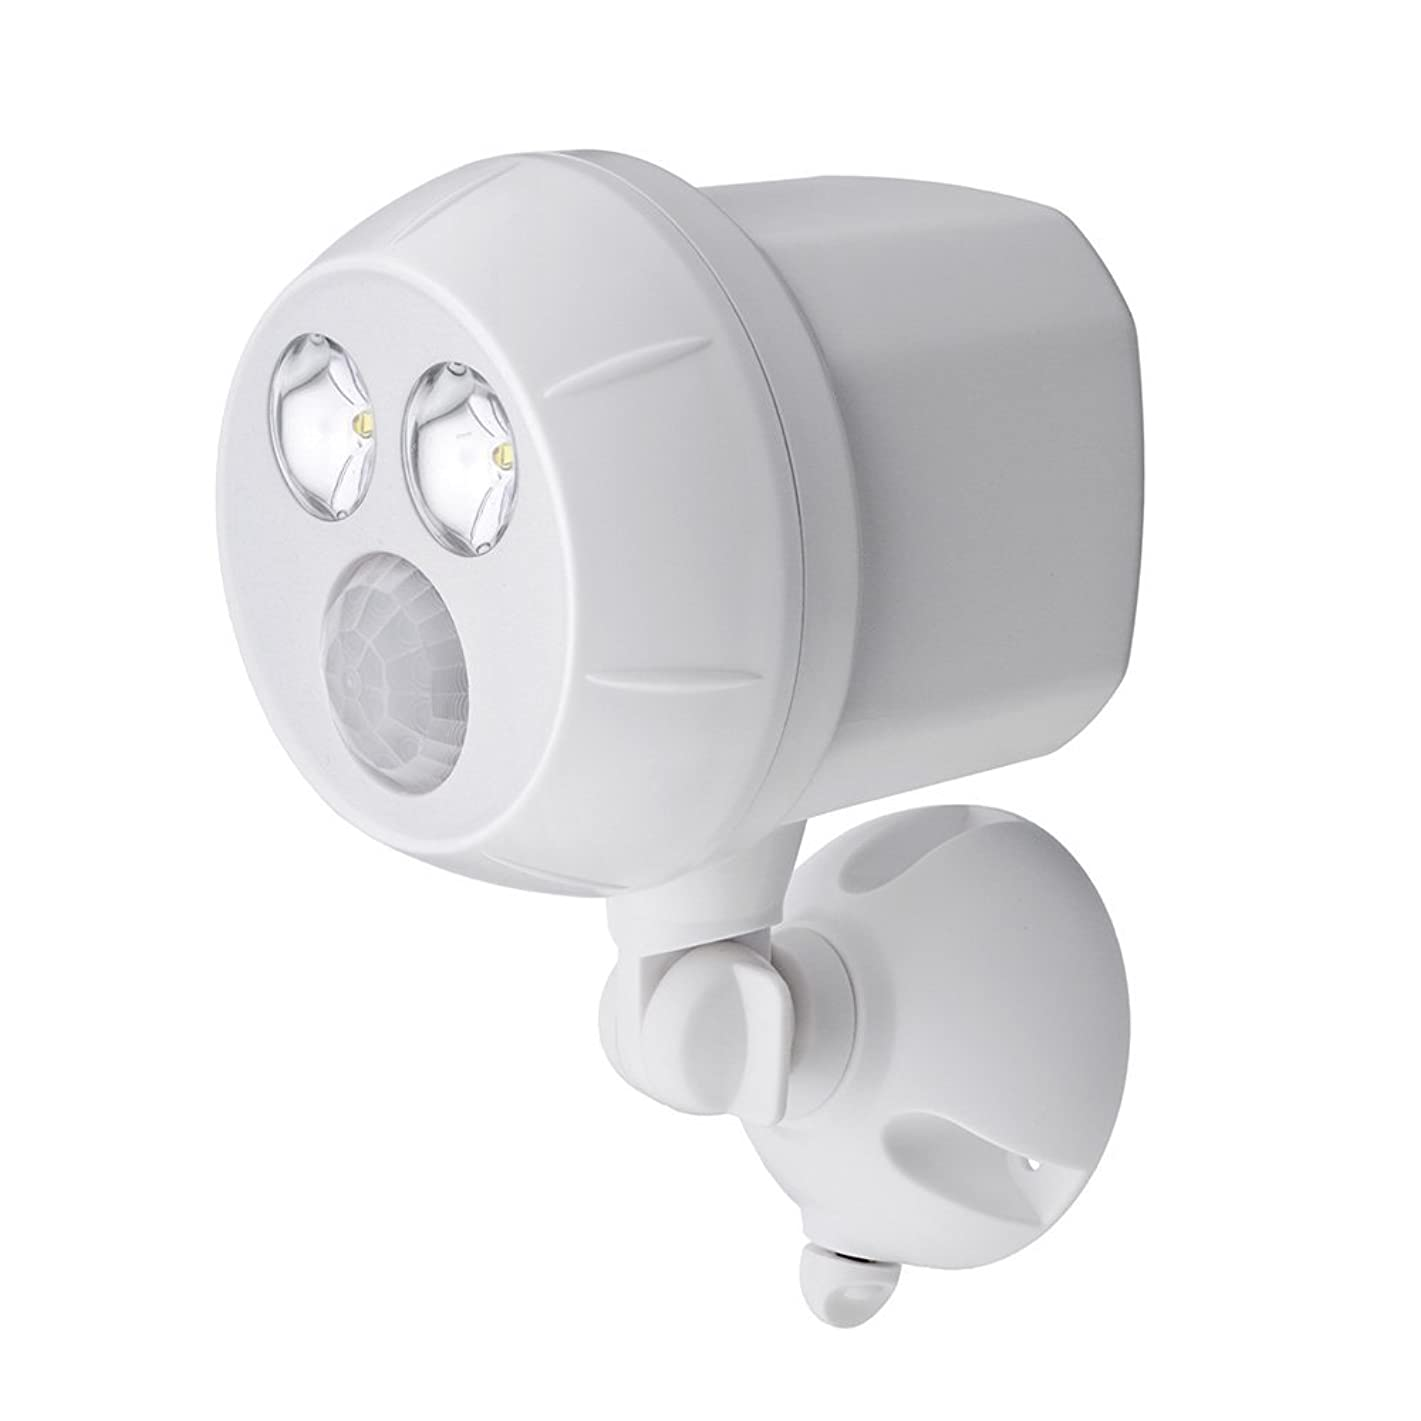 Mr. Beams MB380 Weatherproof Wireless Battery Powered LED Ultra Bright 300 Lumen Spotlight with Motion Sensor, White, 1-Pack